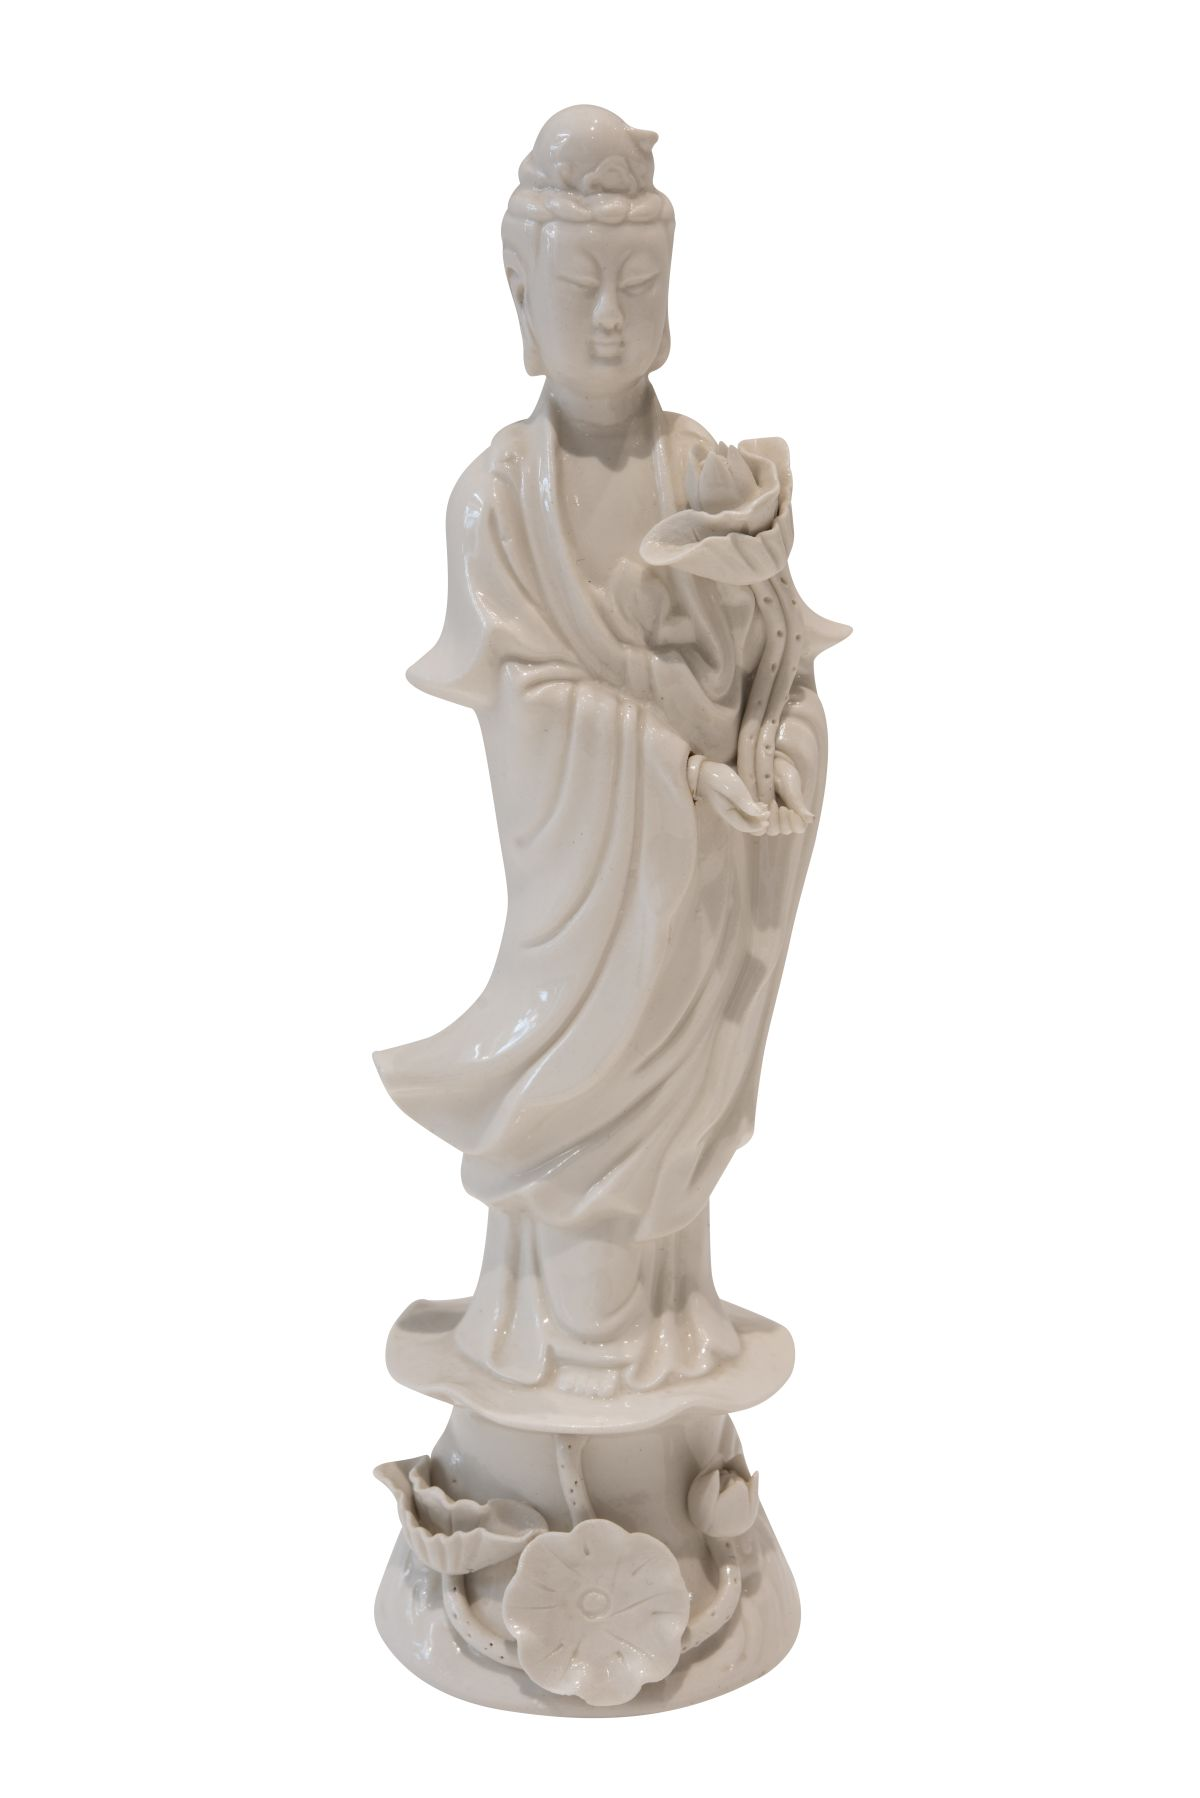 "#66 Blanc de Chine ""Guanyin"", porcelain figure | Blanc de Chine ""Guanyin"", Porzellanfigur Image"